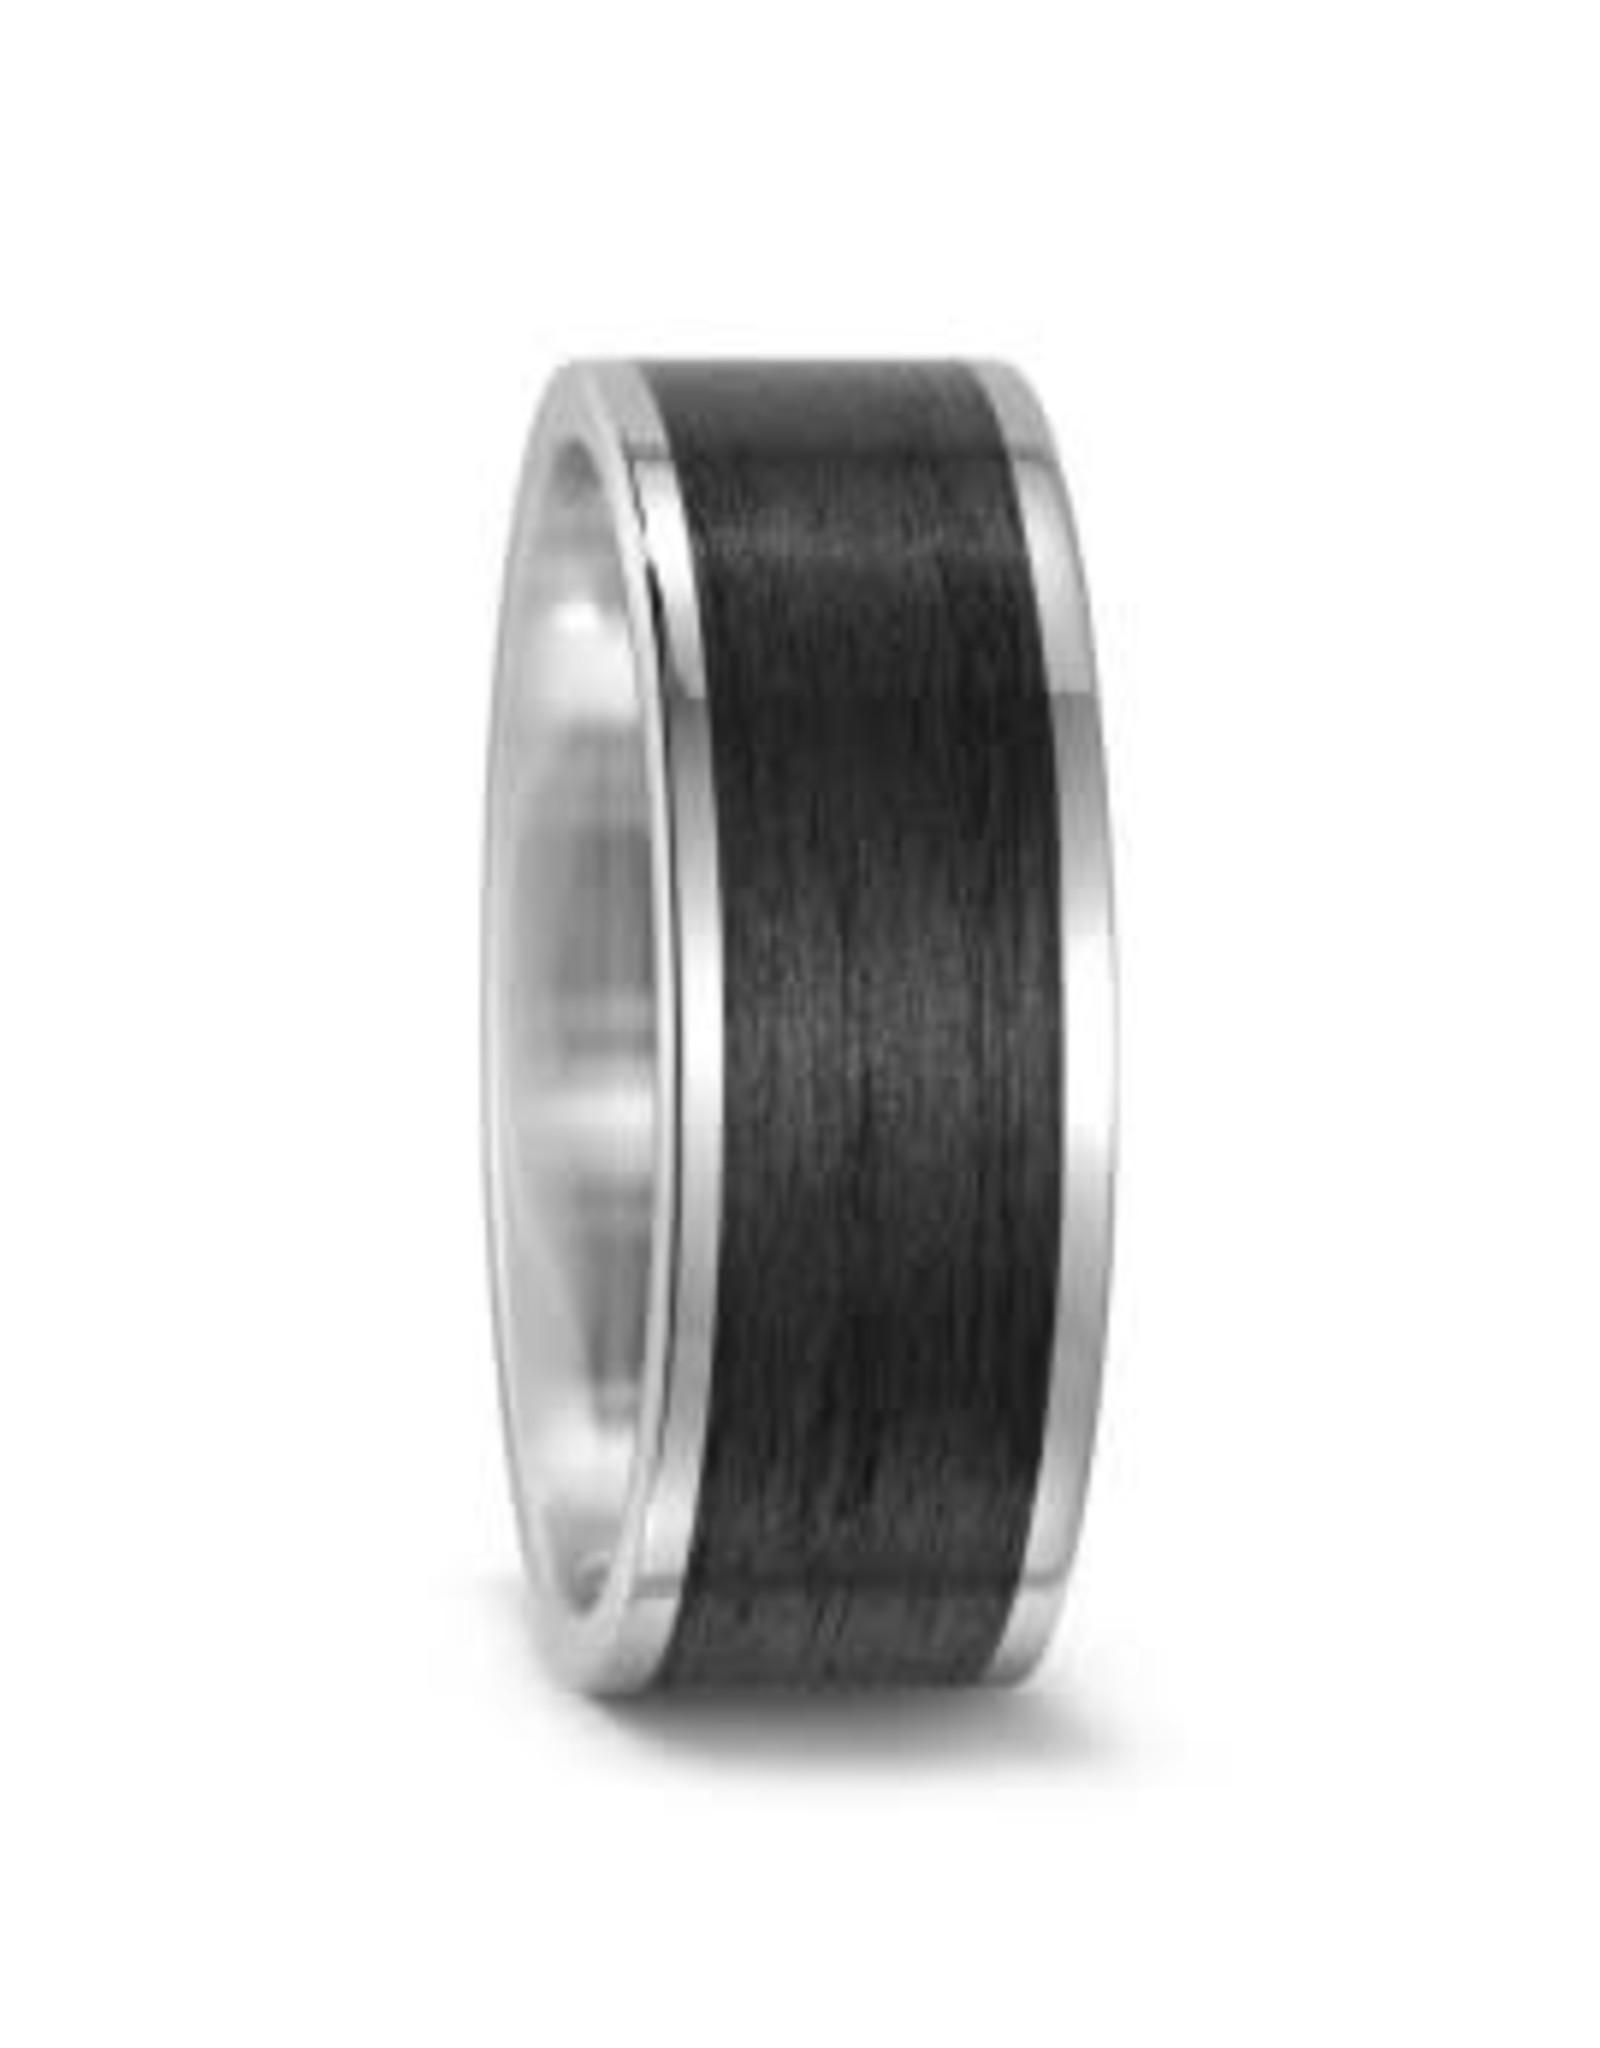 Titan Factory Ring Titan Factory Titanium TF/52488/000/000/20 - 8 mm maat 64